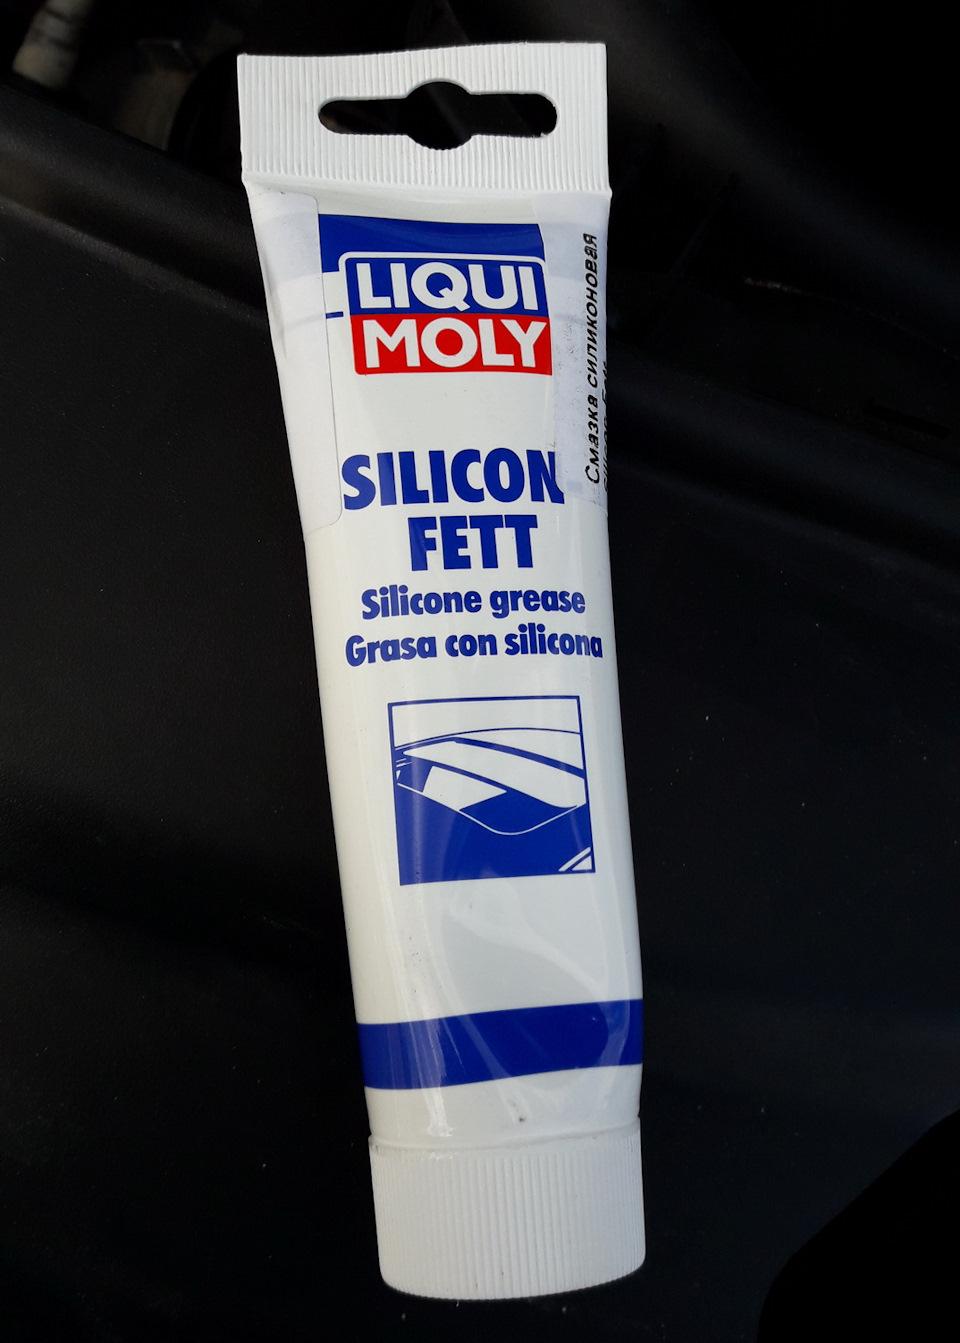 Liquimoly Silicon-Fett — силиконовая смазка, многоцелевая.